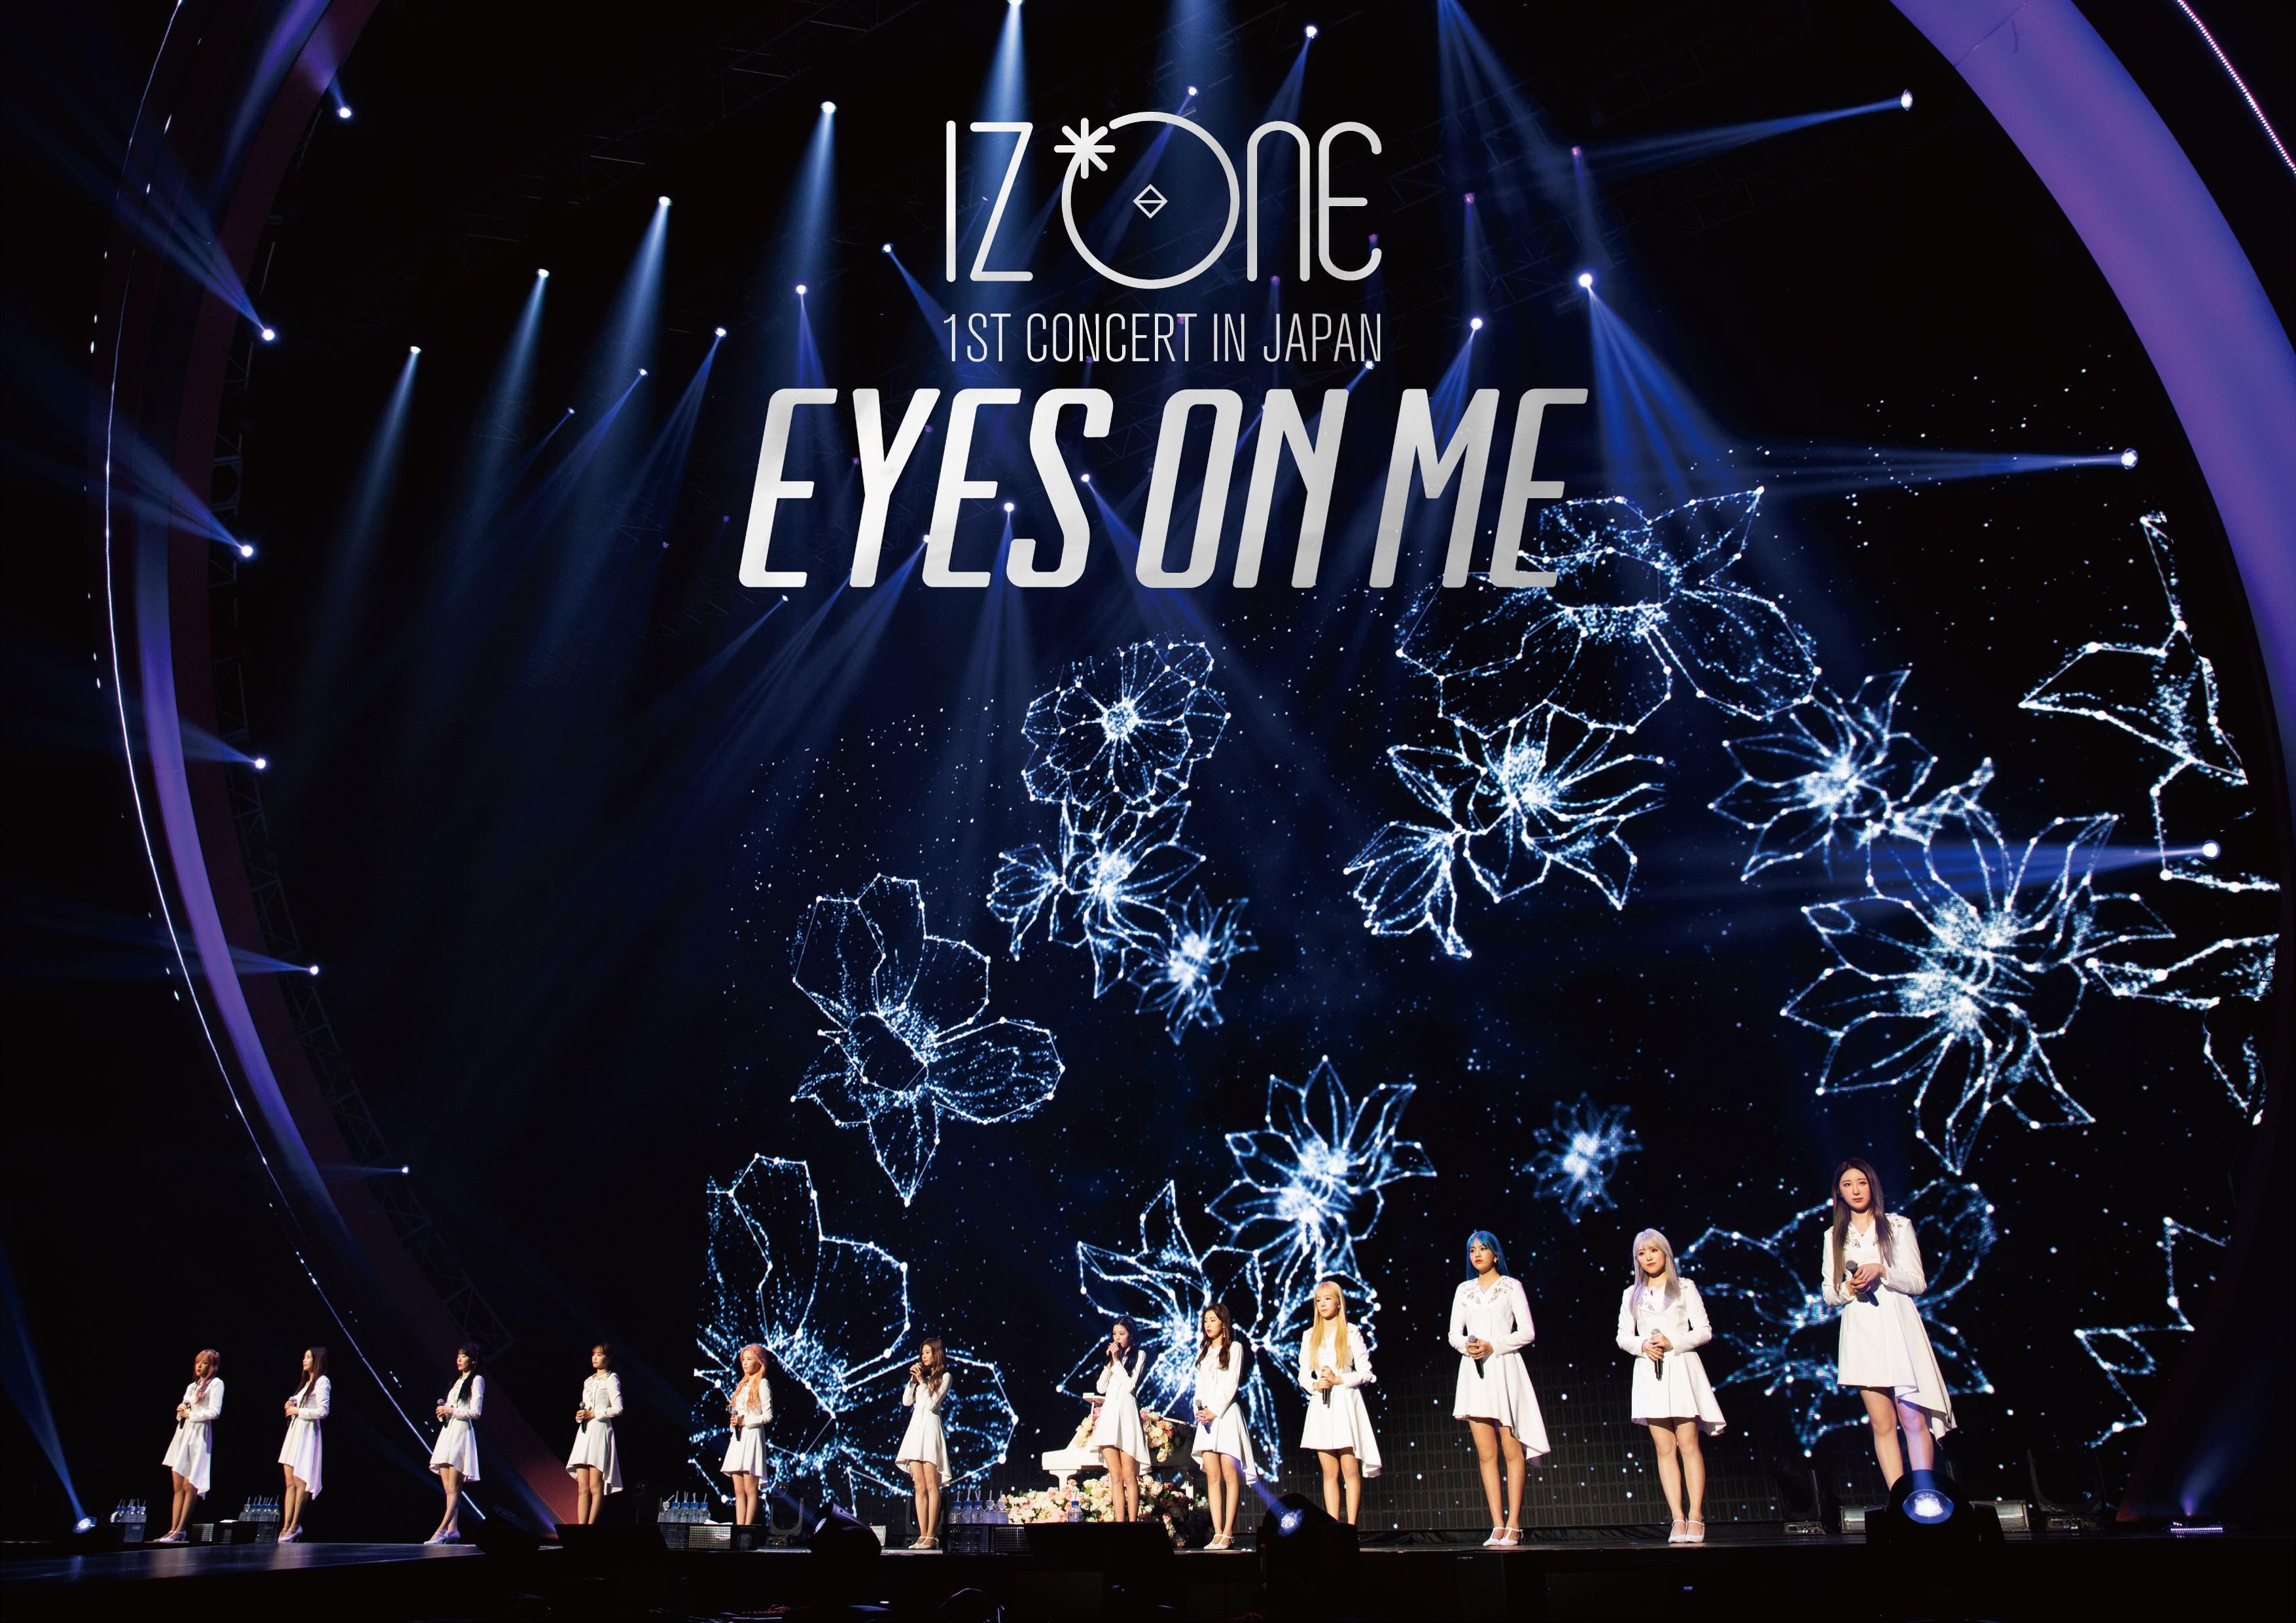 IZ*ONE – IZ*ONE 1st Concert in Japan [Eyes On Me] Tour Final @ Saitama Super Arena [2xBlu-ray ISO] [2021.04.14]